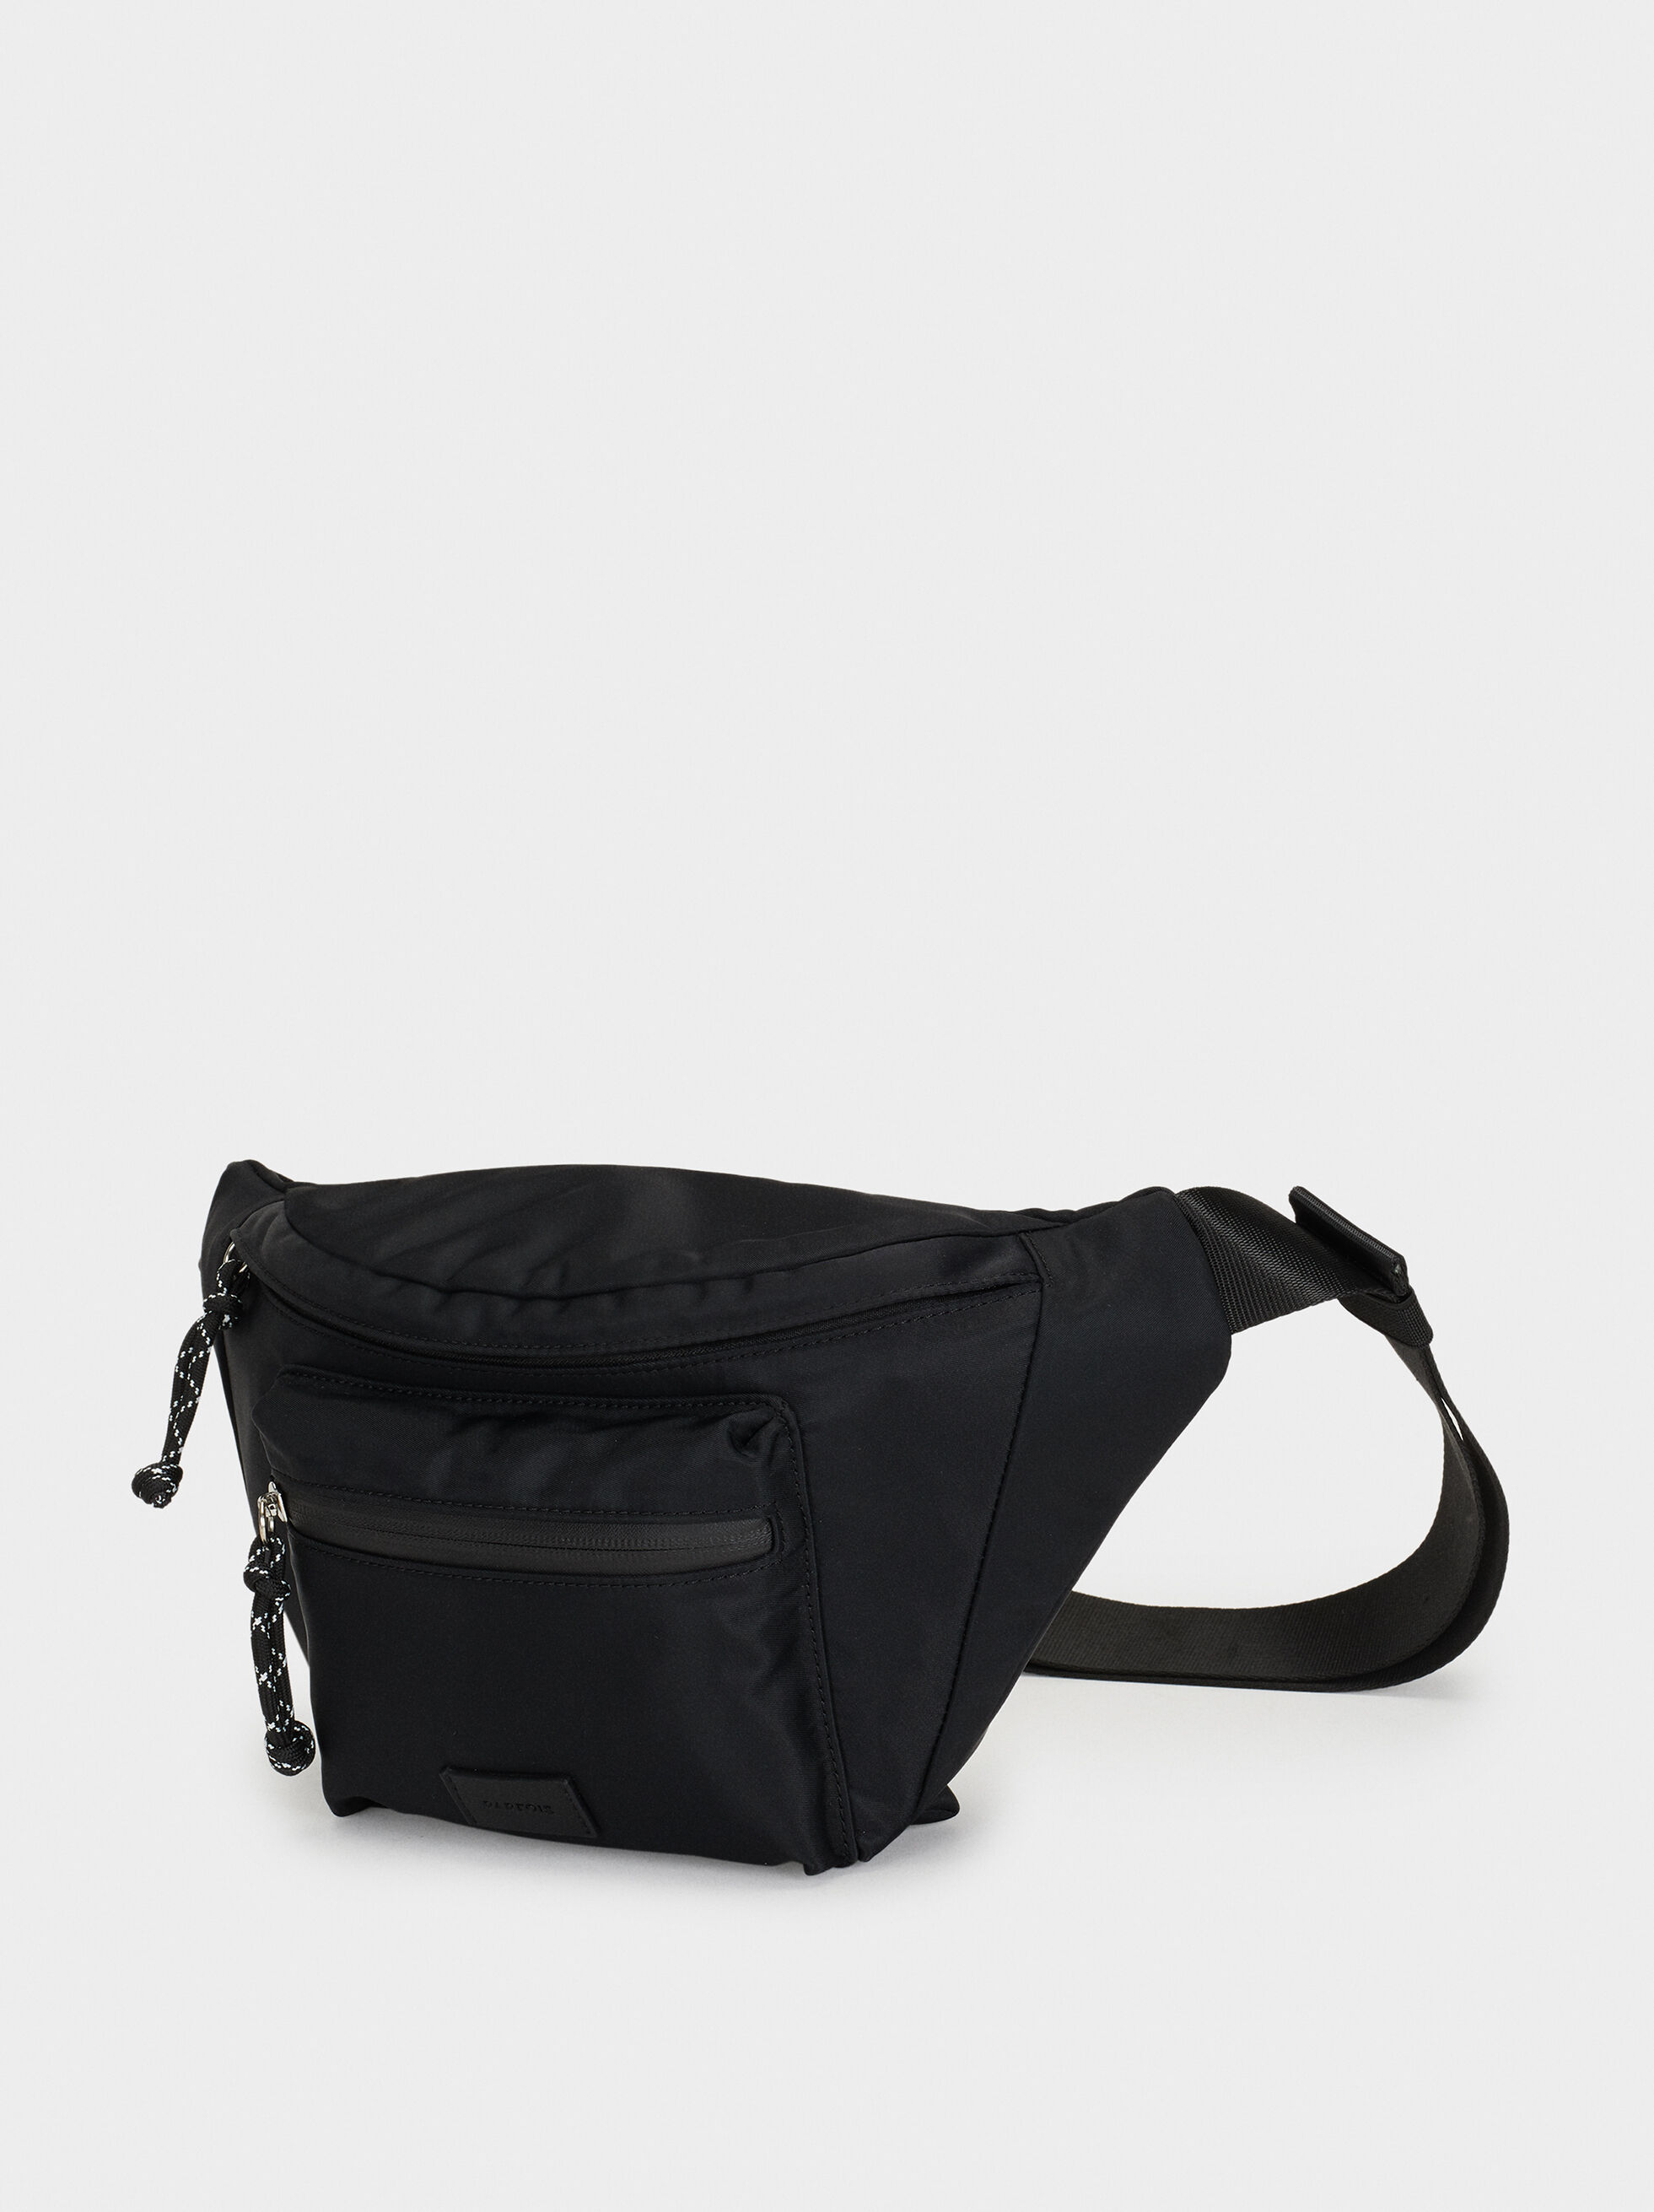 Nylon Belt Bag, Black, hi-res